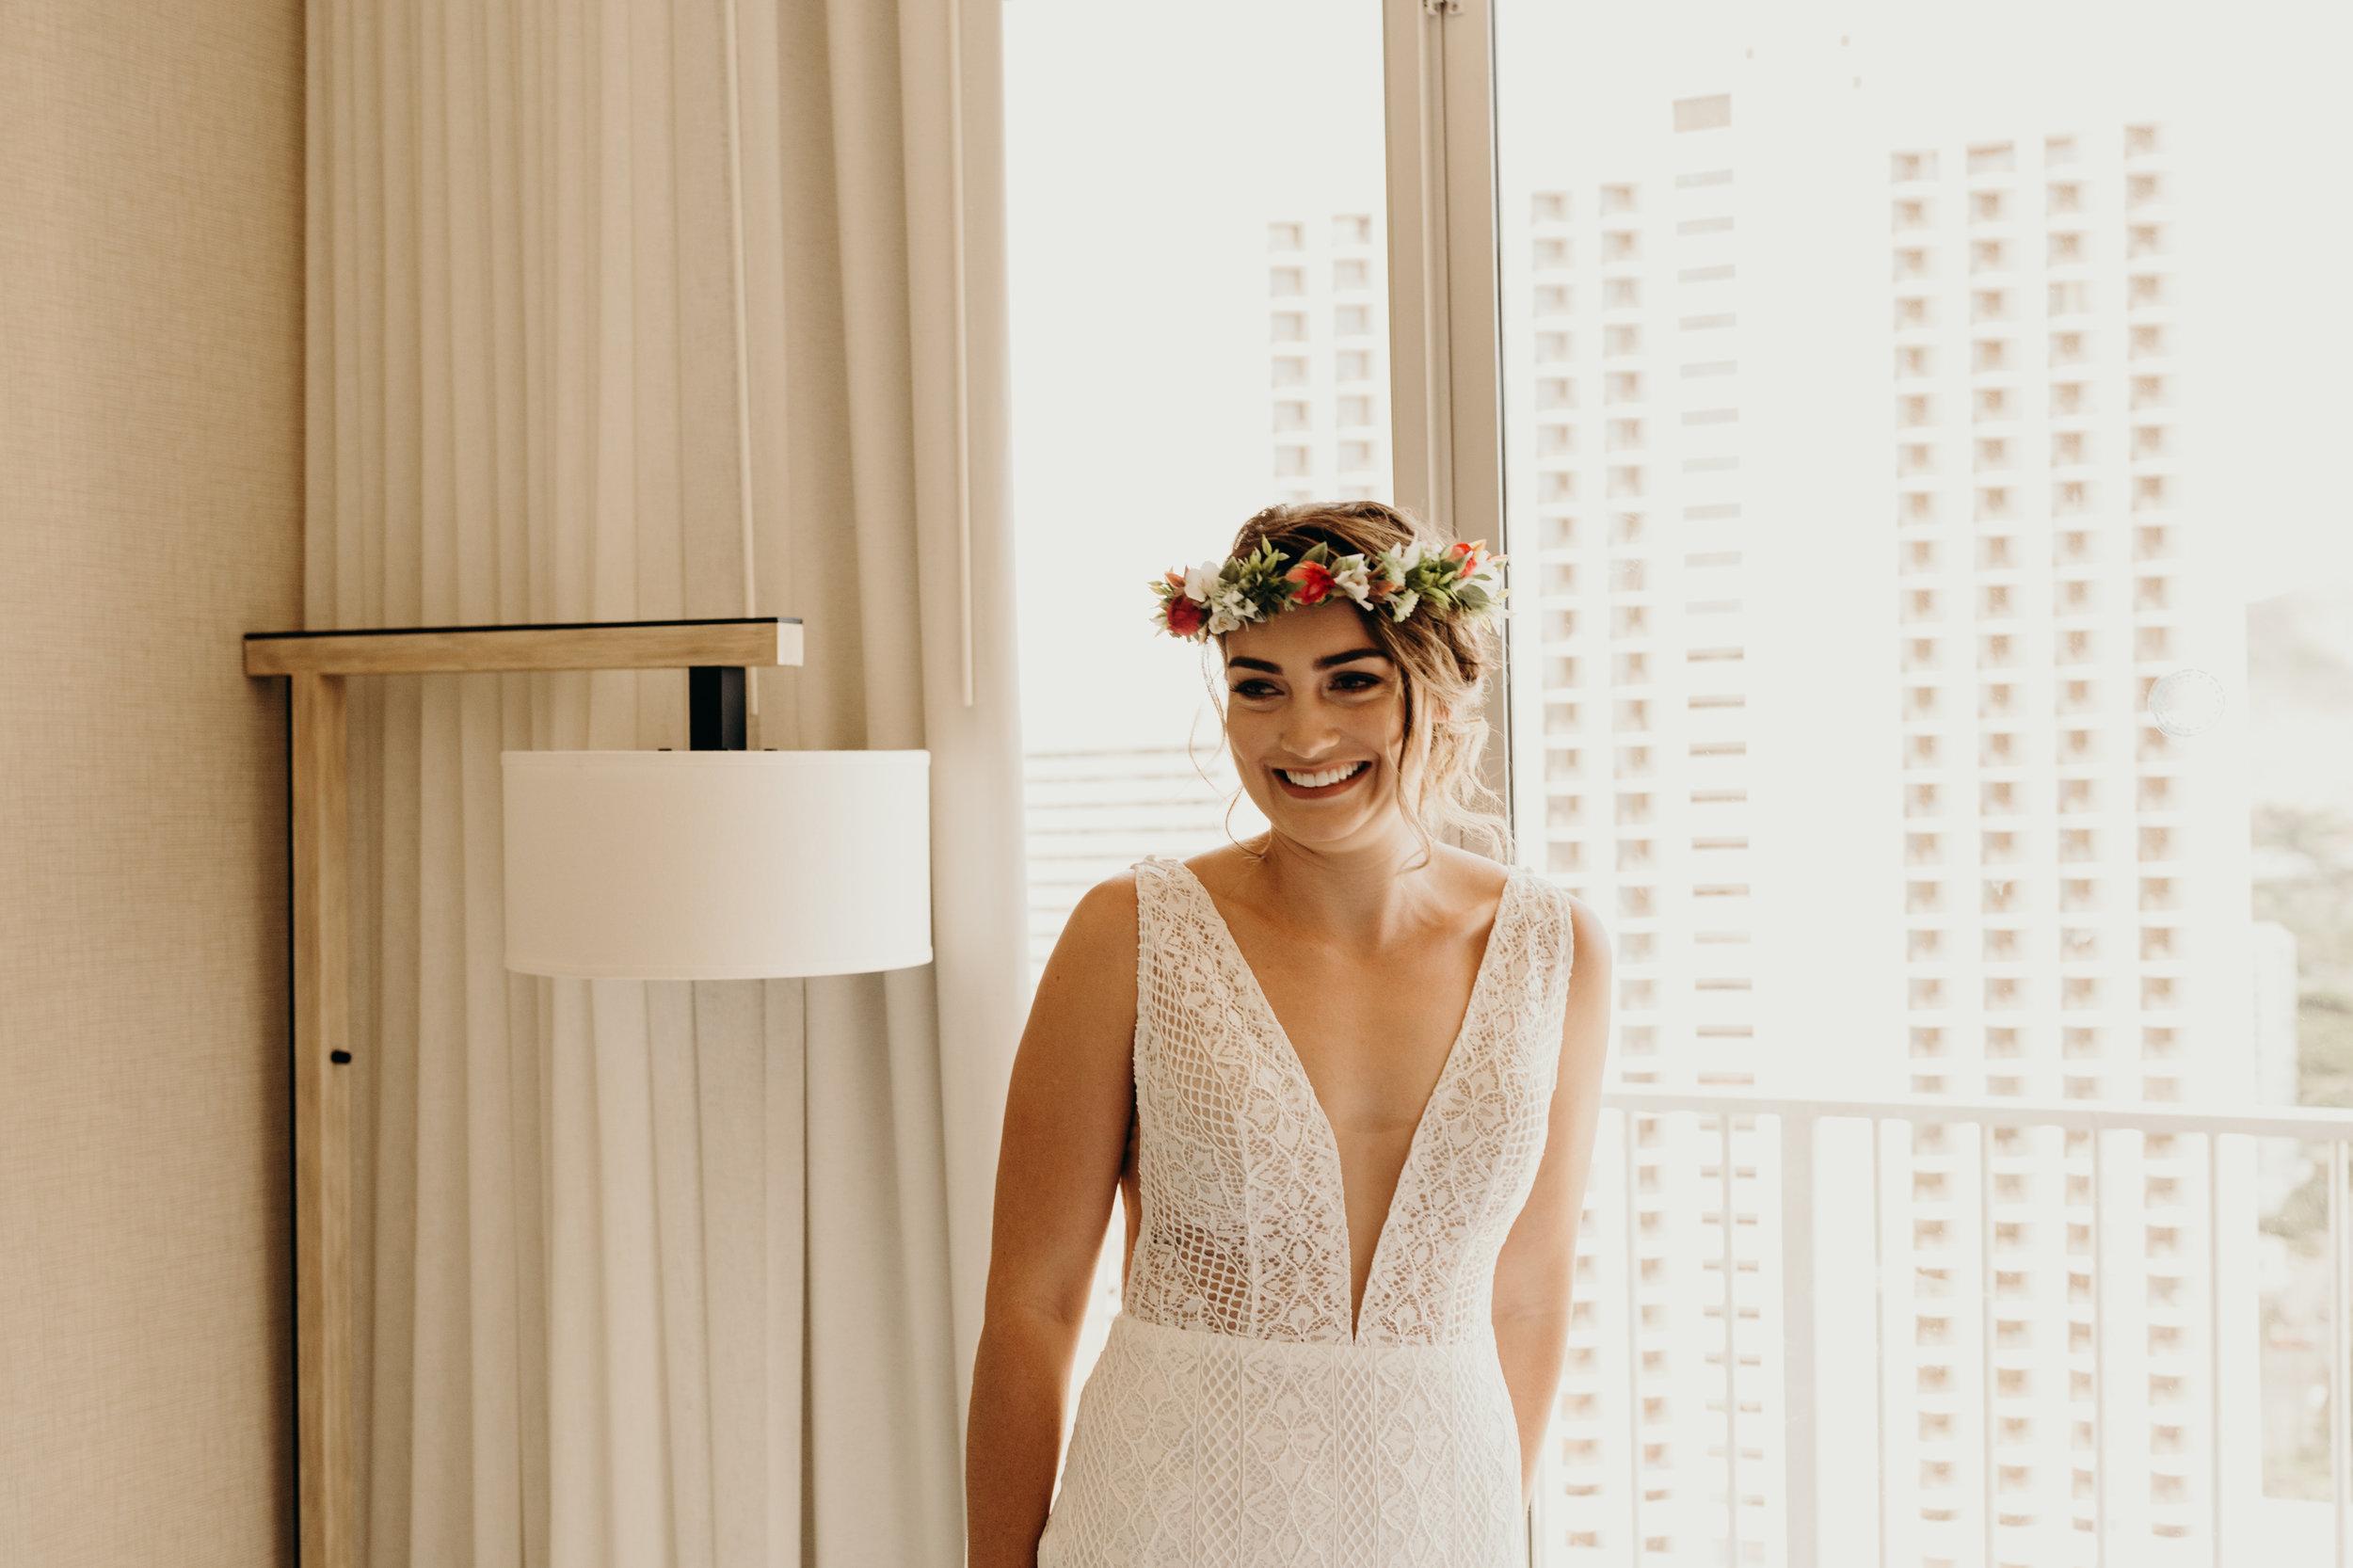 HAWAII-WEDDING-PHOTOGRAPHER-ALOHILANI-RESORT-KEANI-BAKULA-25.jpg